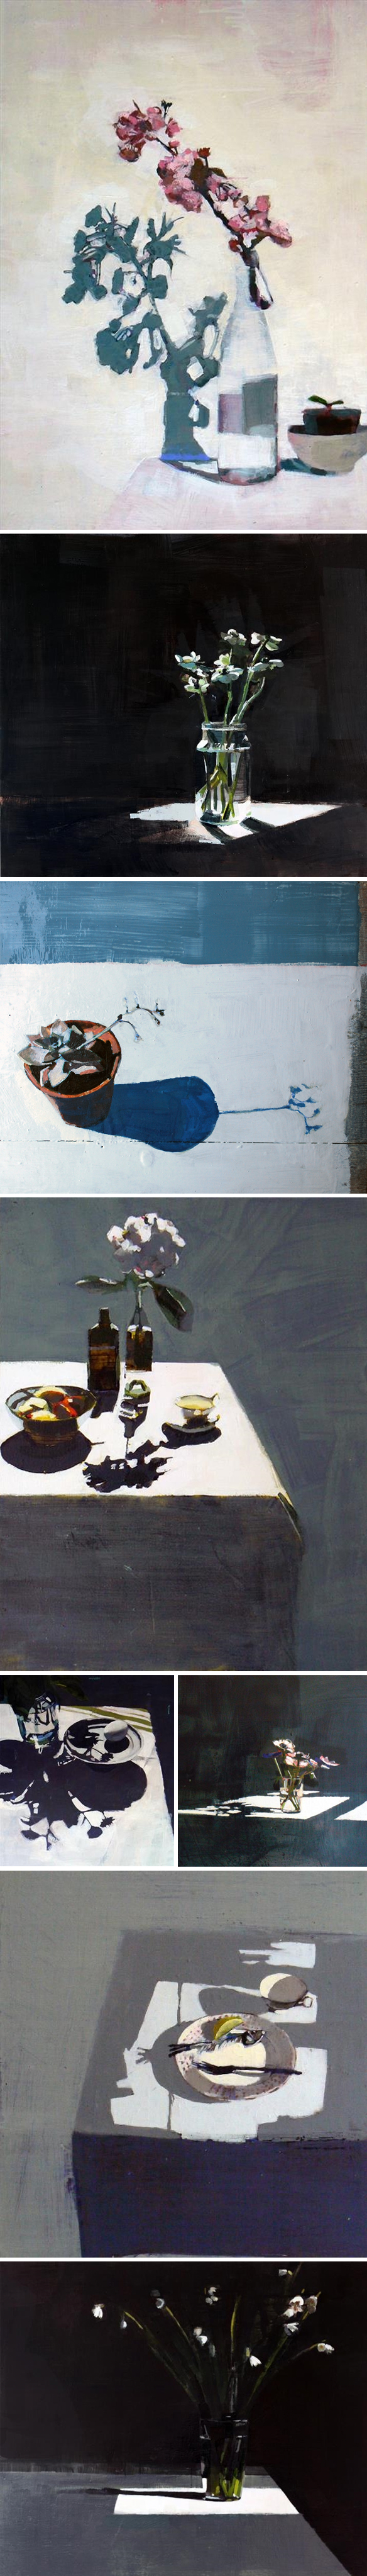 Susan Ashworth